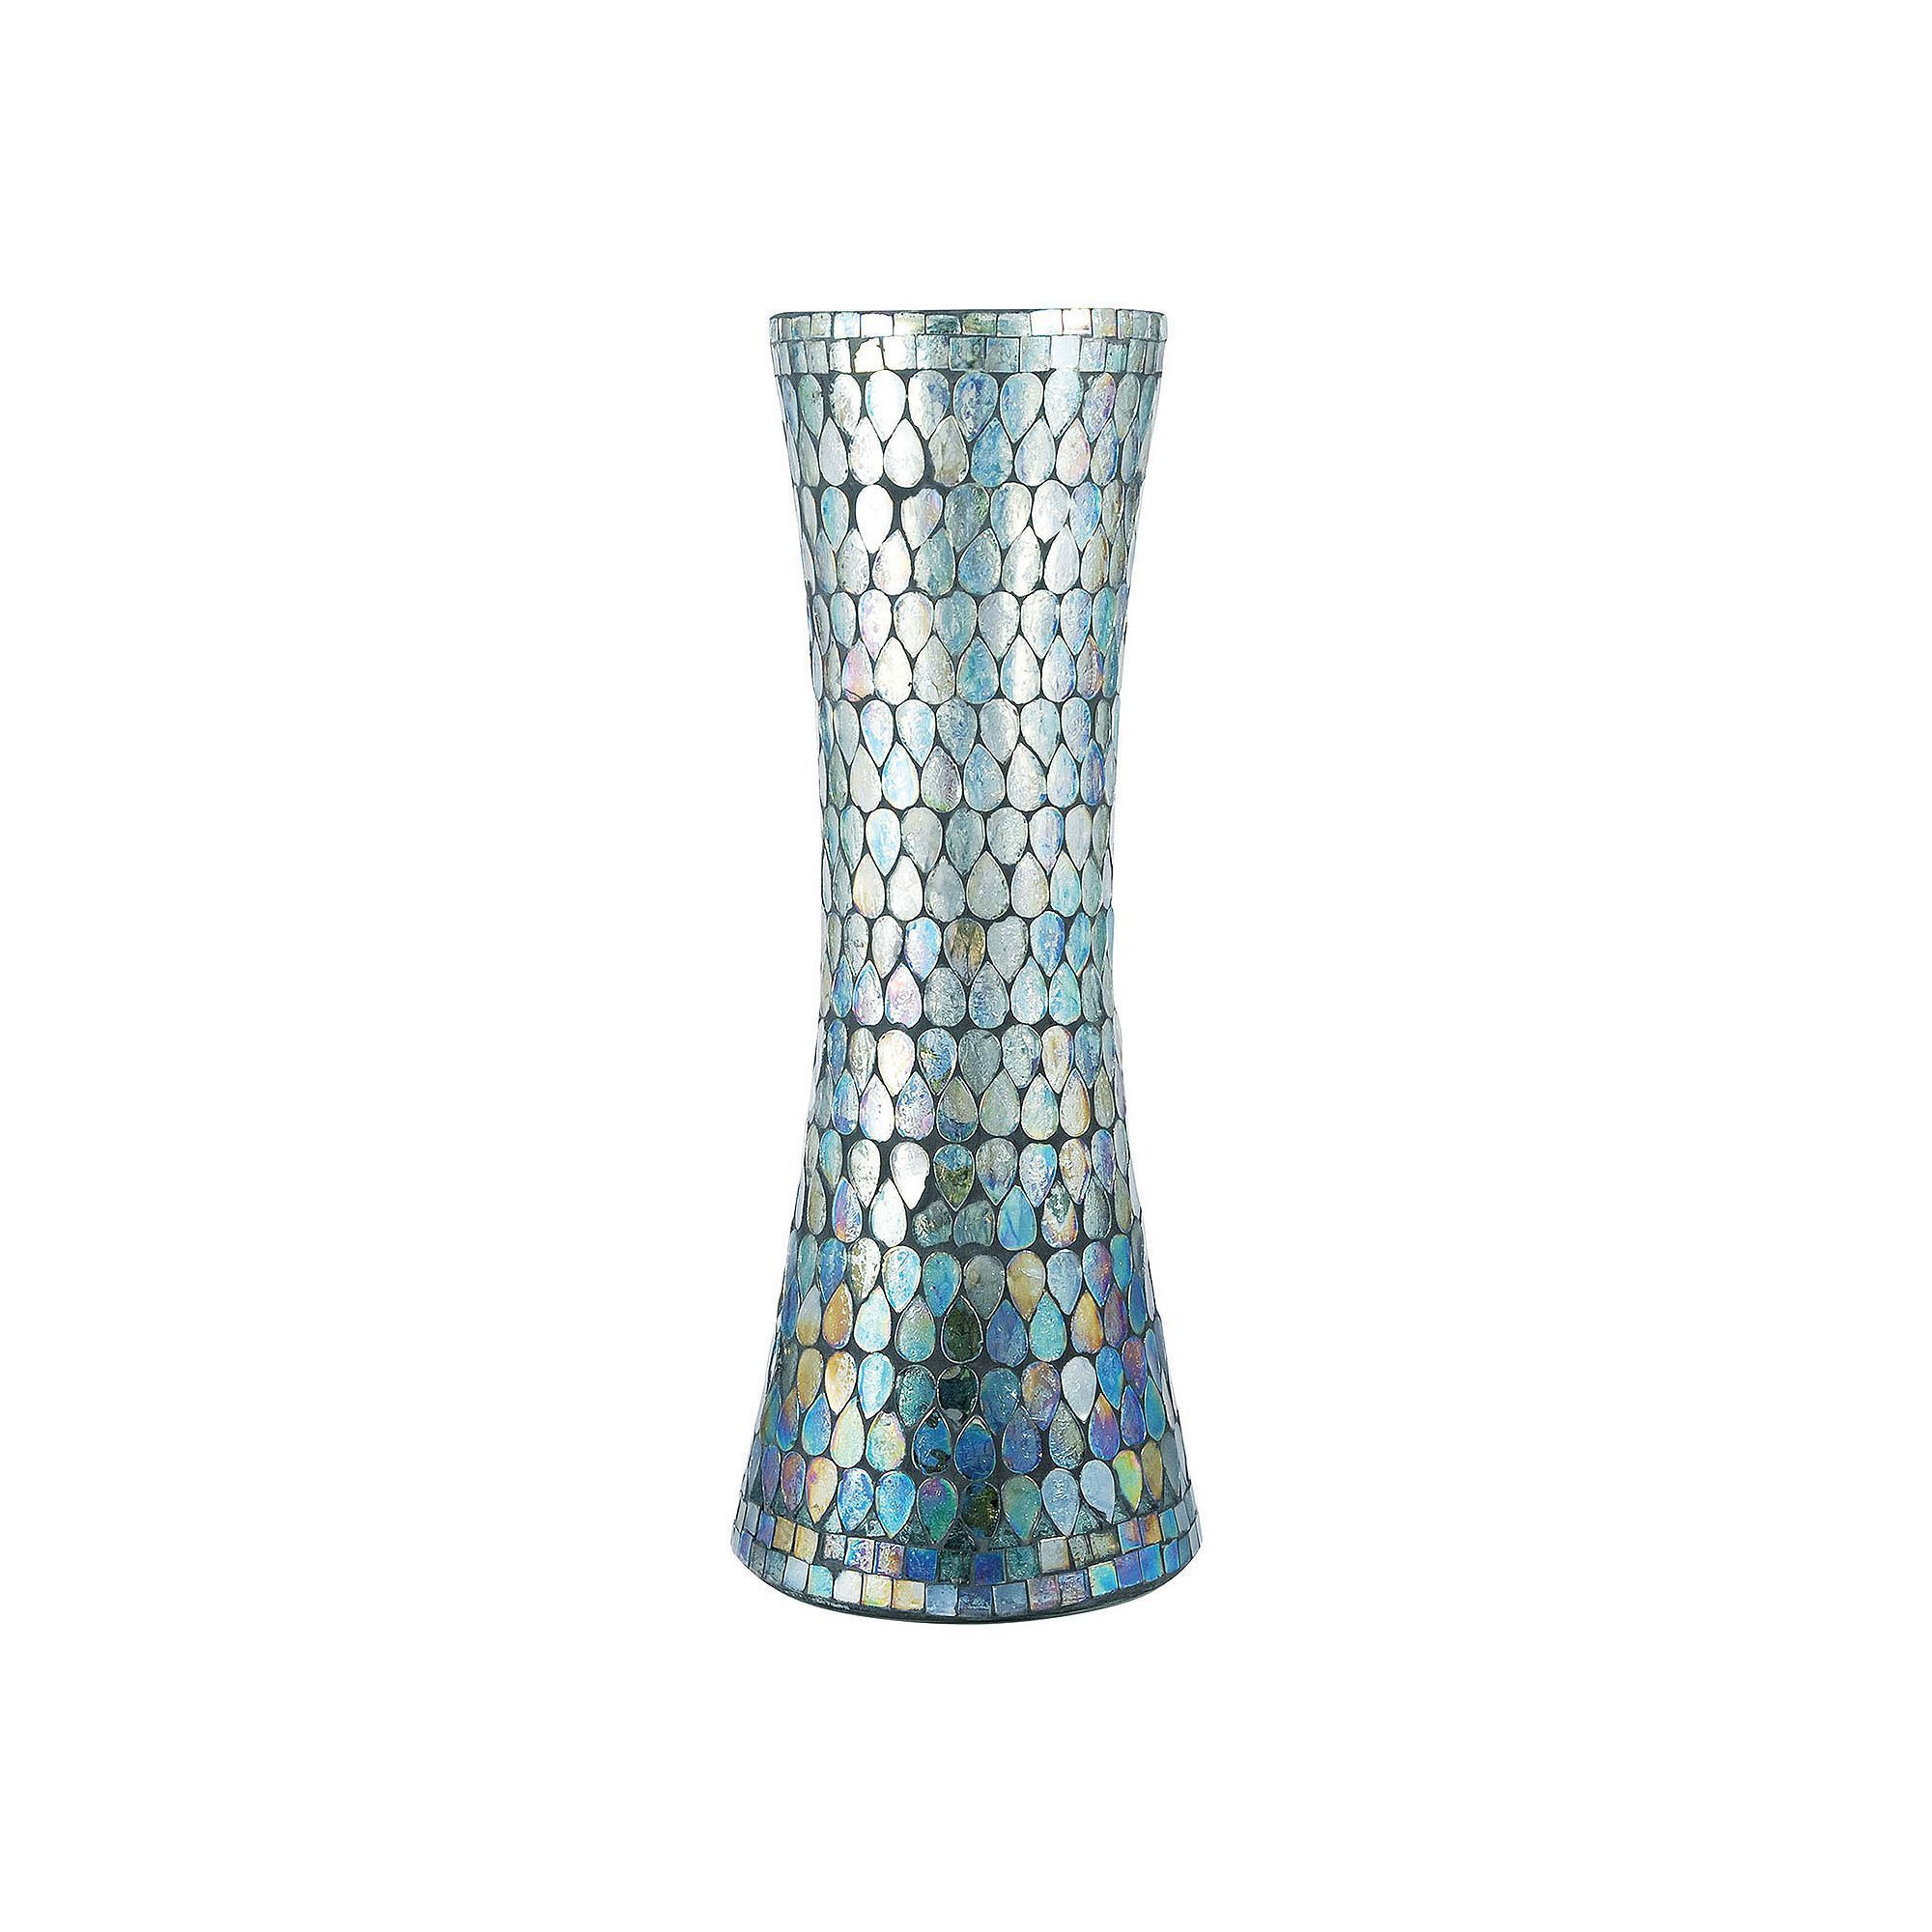 mosaic glass vases for sale of pomeroy shimmer mosaic vase mosaic vase and products inside pomeroy shimmer mosaic vase